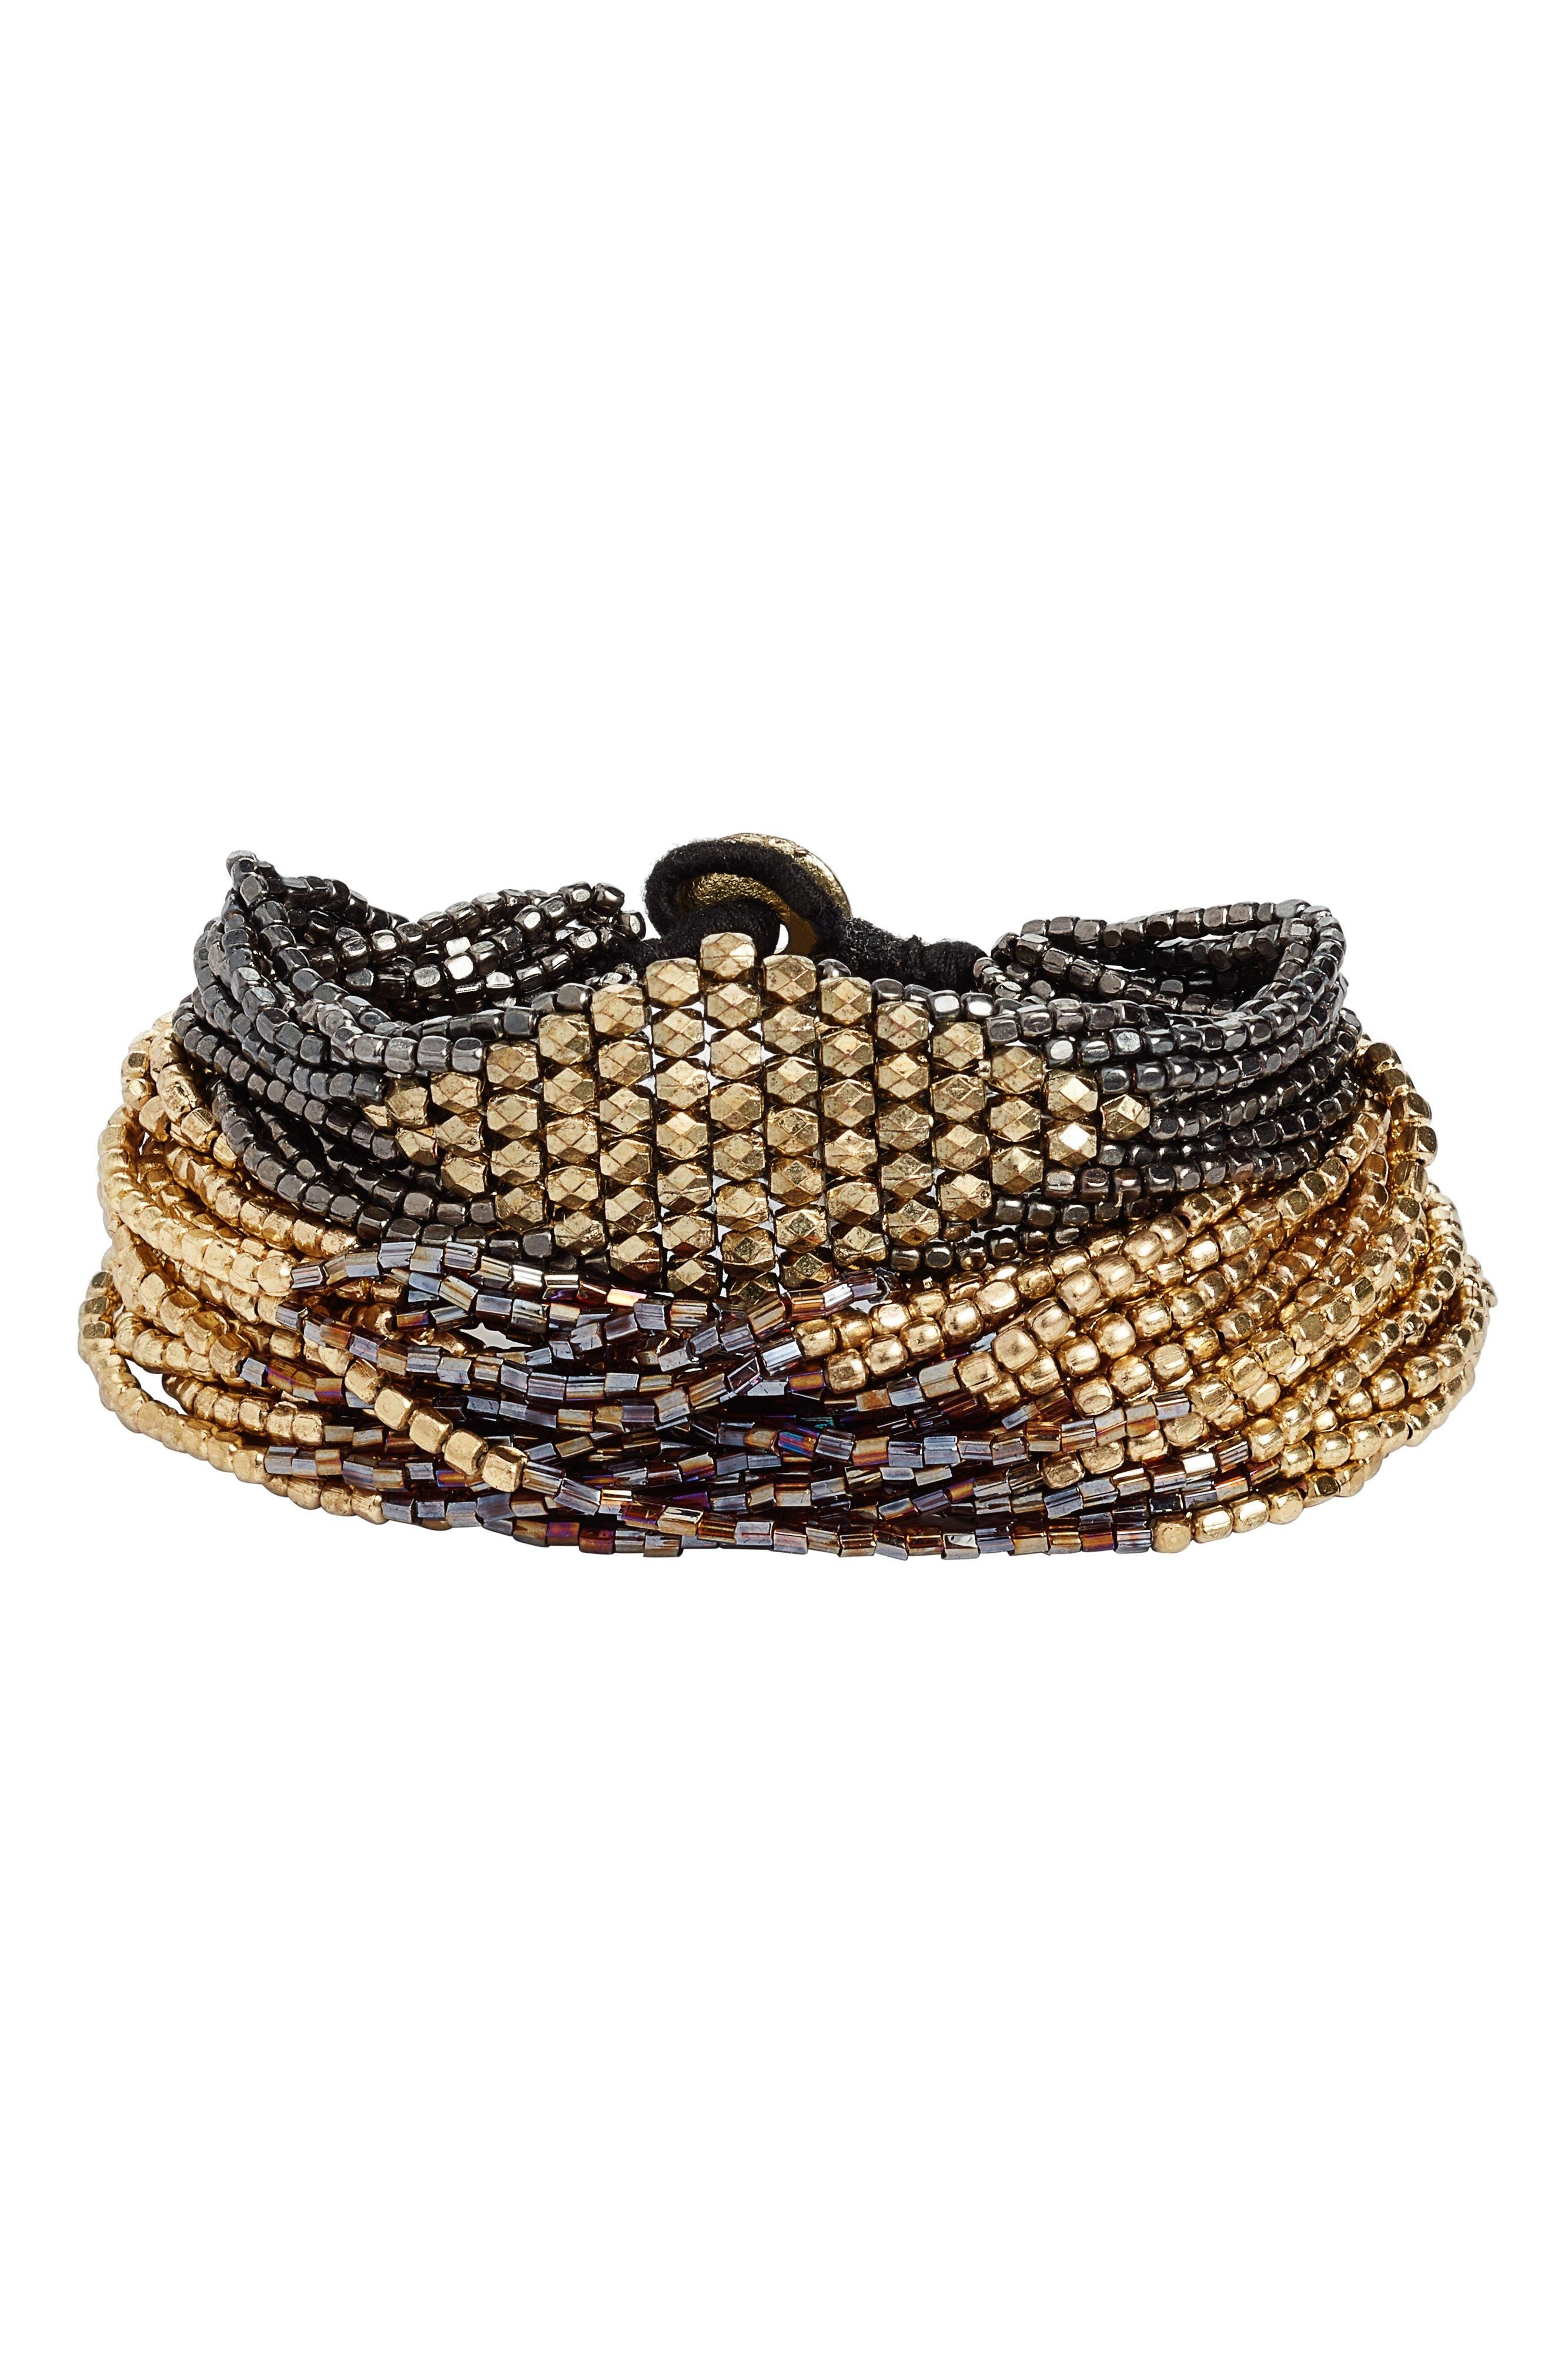 Alternate Image 1 Selected - Ink + Alloy Set of 2 Beaded Bracelets